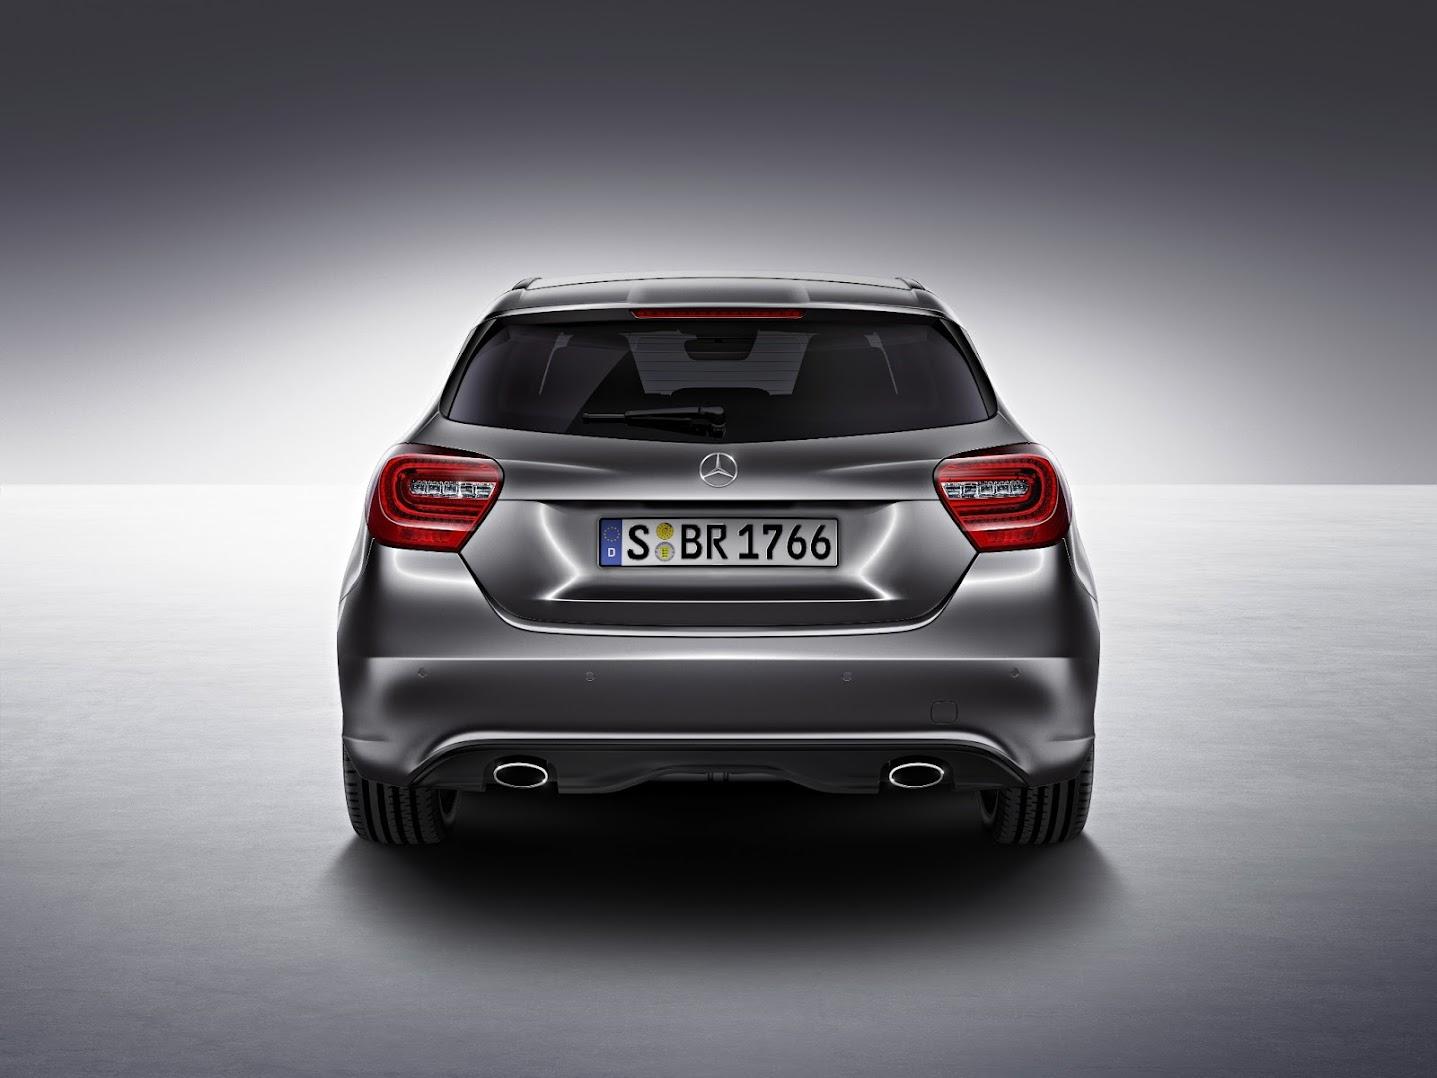 *Mercedes-Benz The new A-Class 跟著蔡依林搭載小鋼砲新血來襲:「PROJECT A+」萬人電音派對! 9